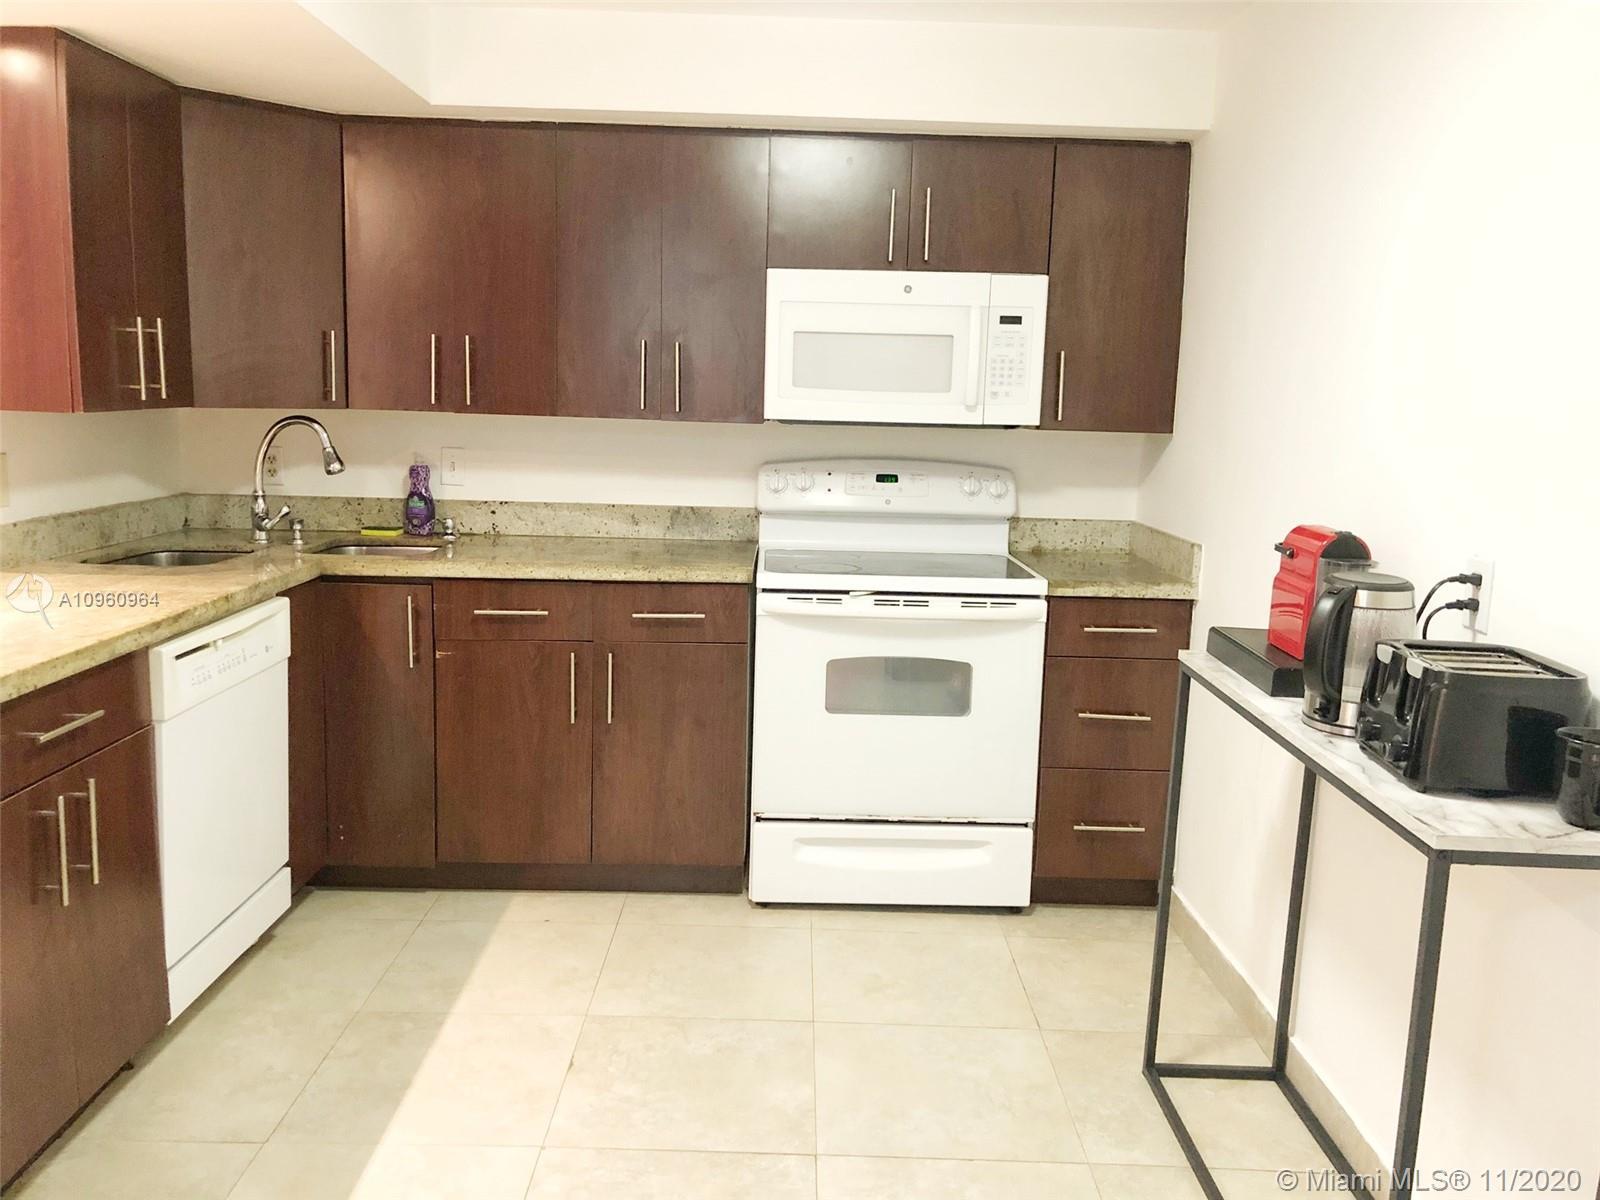 400 Leslie Dr # 223, Hallandale Beach, Florida 33009, 2 Bedrooms Bedrooms, ,2 BathroomsBathrooms,Residential Lease,For Rent,400 Leslie Dr # 223,A10960964